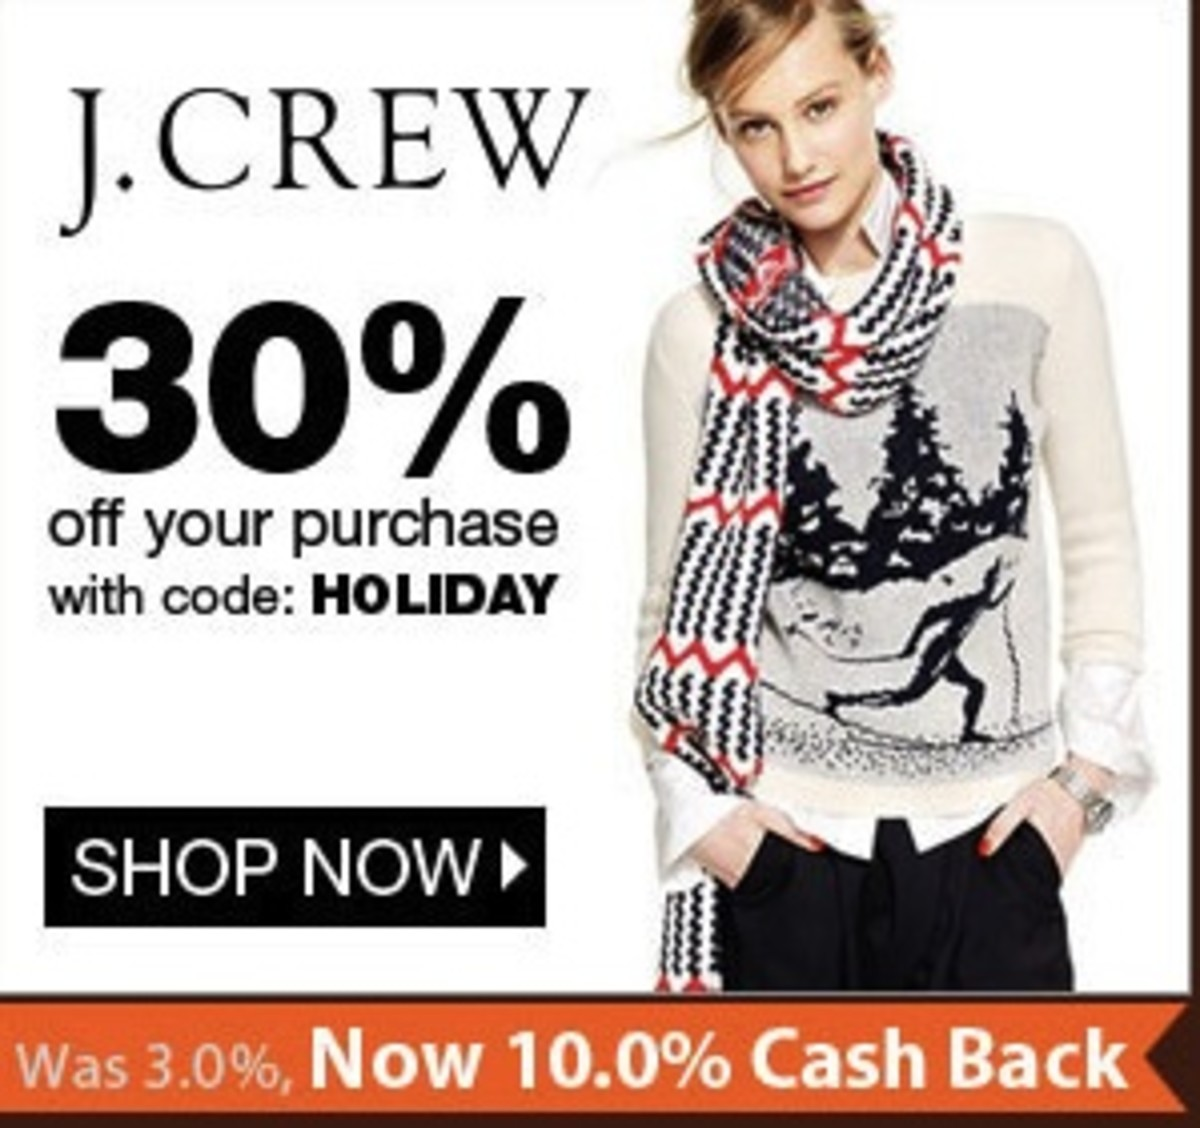 jcrew ebates deal